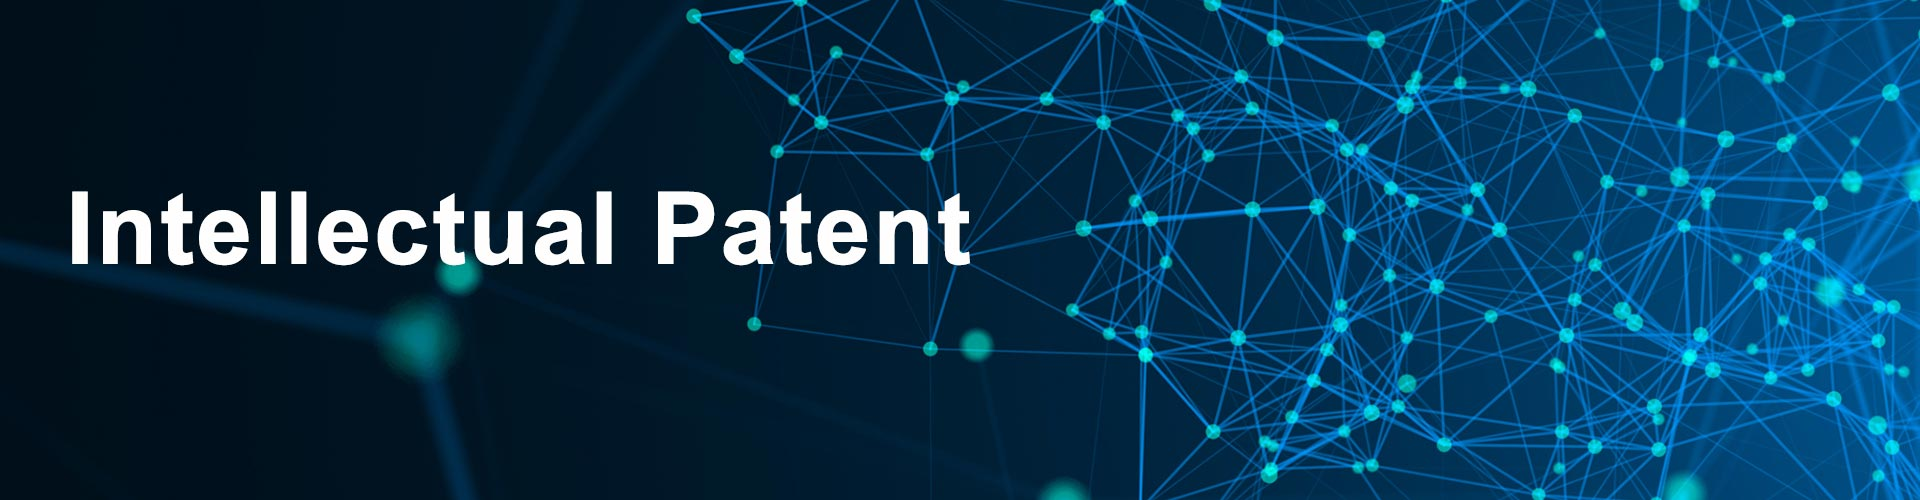 Cyansky Intellectual Patents Illustration Page